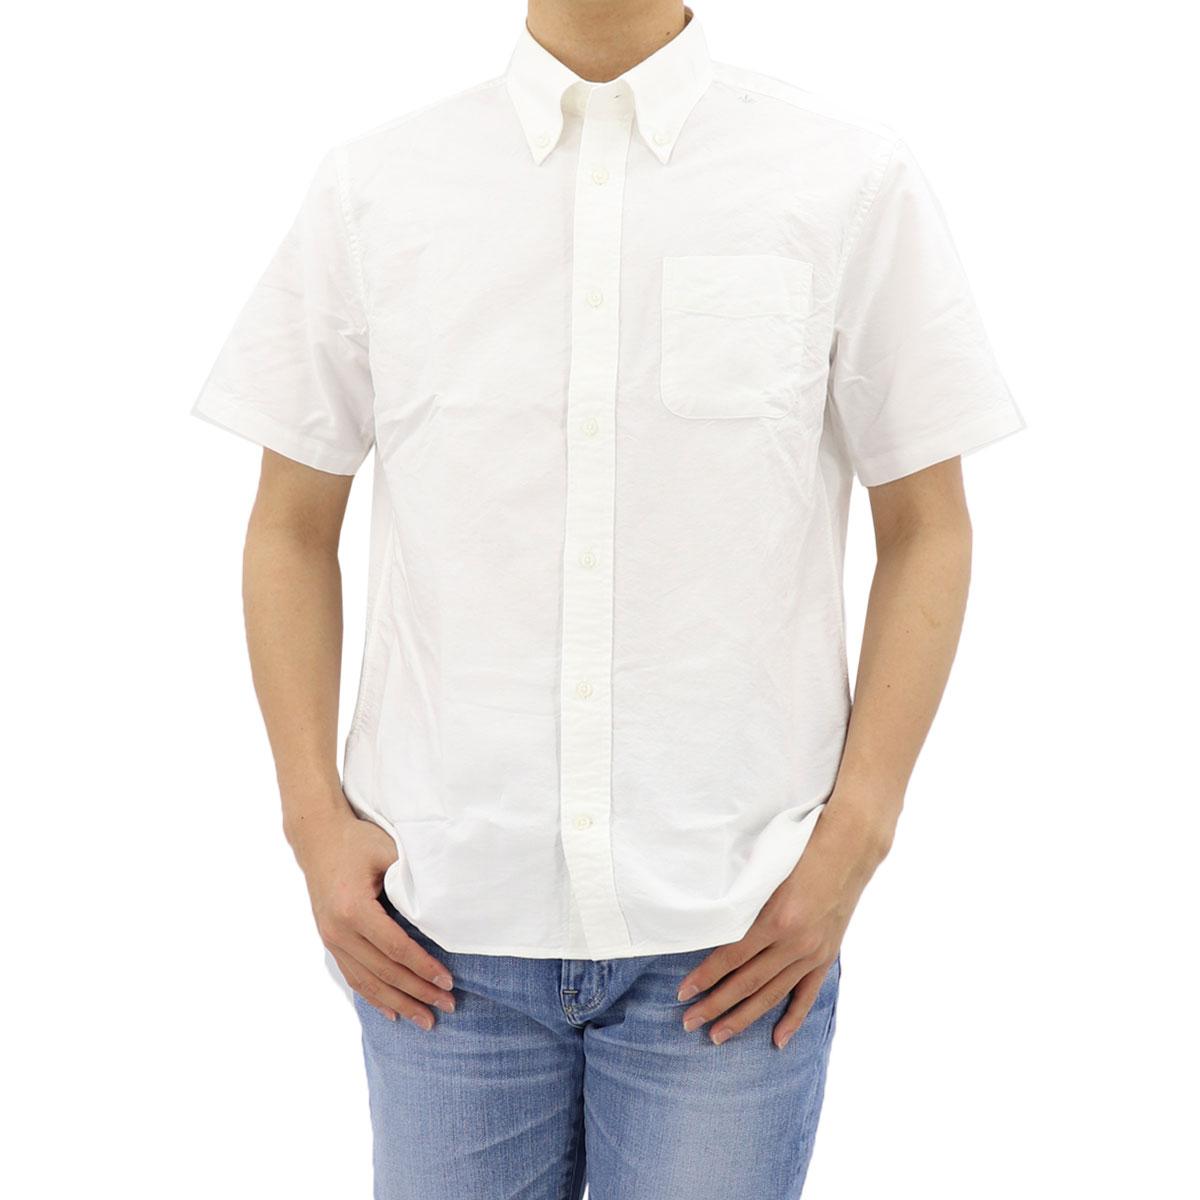 ★NEW!!定番 オックスフォード ボタンダウンシャツ 半袖(4colors)